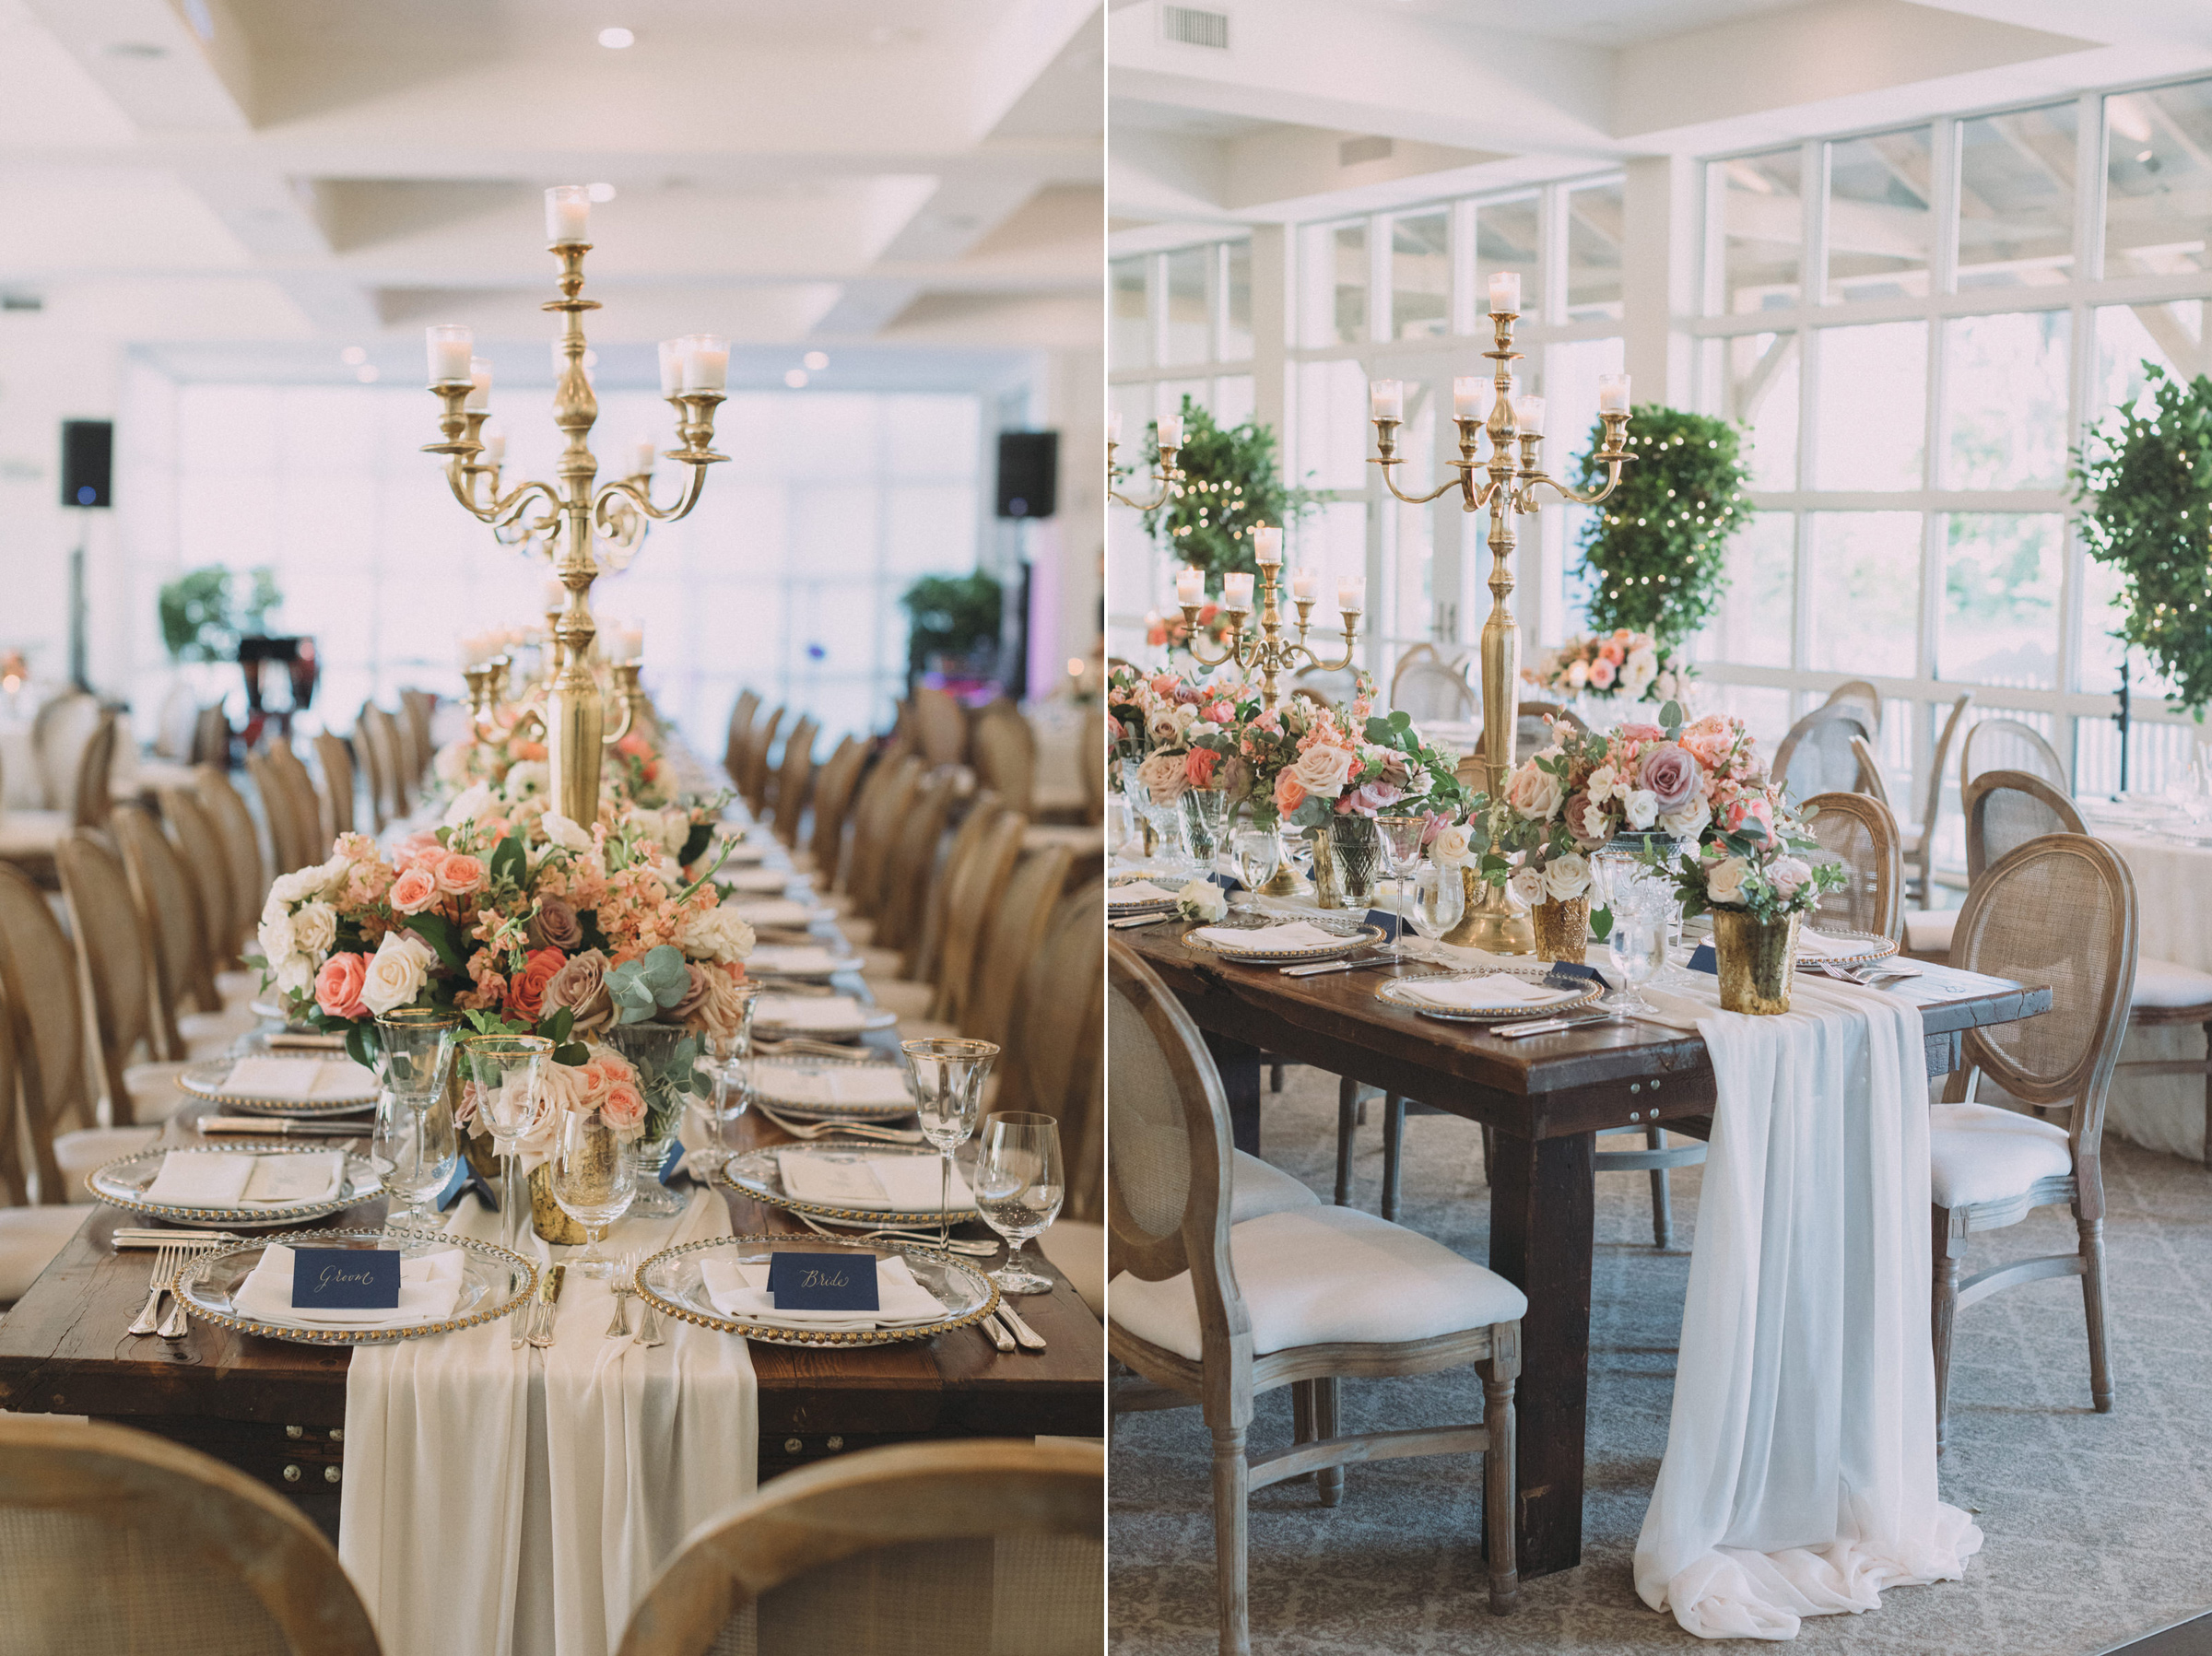 Langdon-Hall-wedding-photography-Cambridge-by-Sam-Wong-of-Visual-Cravings_Sarah-Ryan_47.jpg